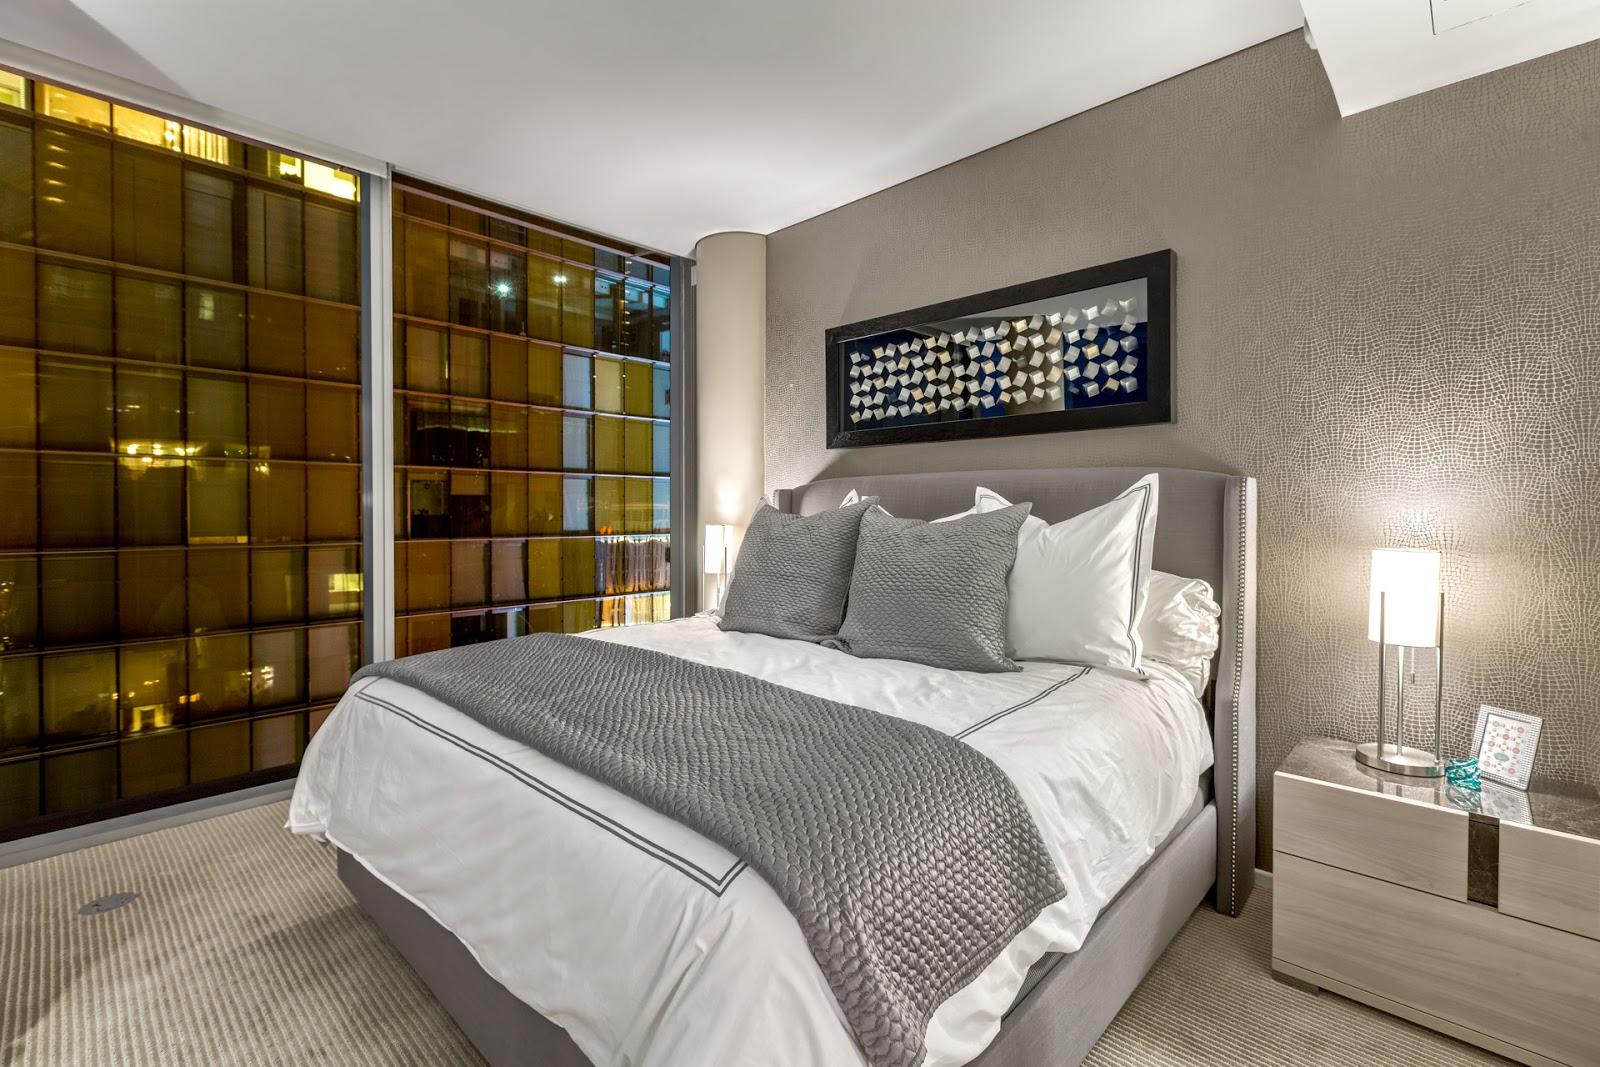 Las Vegas, NV Condos For Sale - 1,295 Listings Trulia